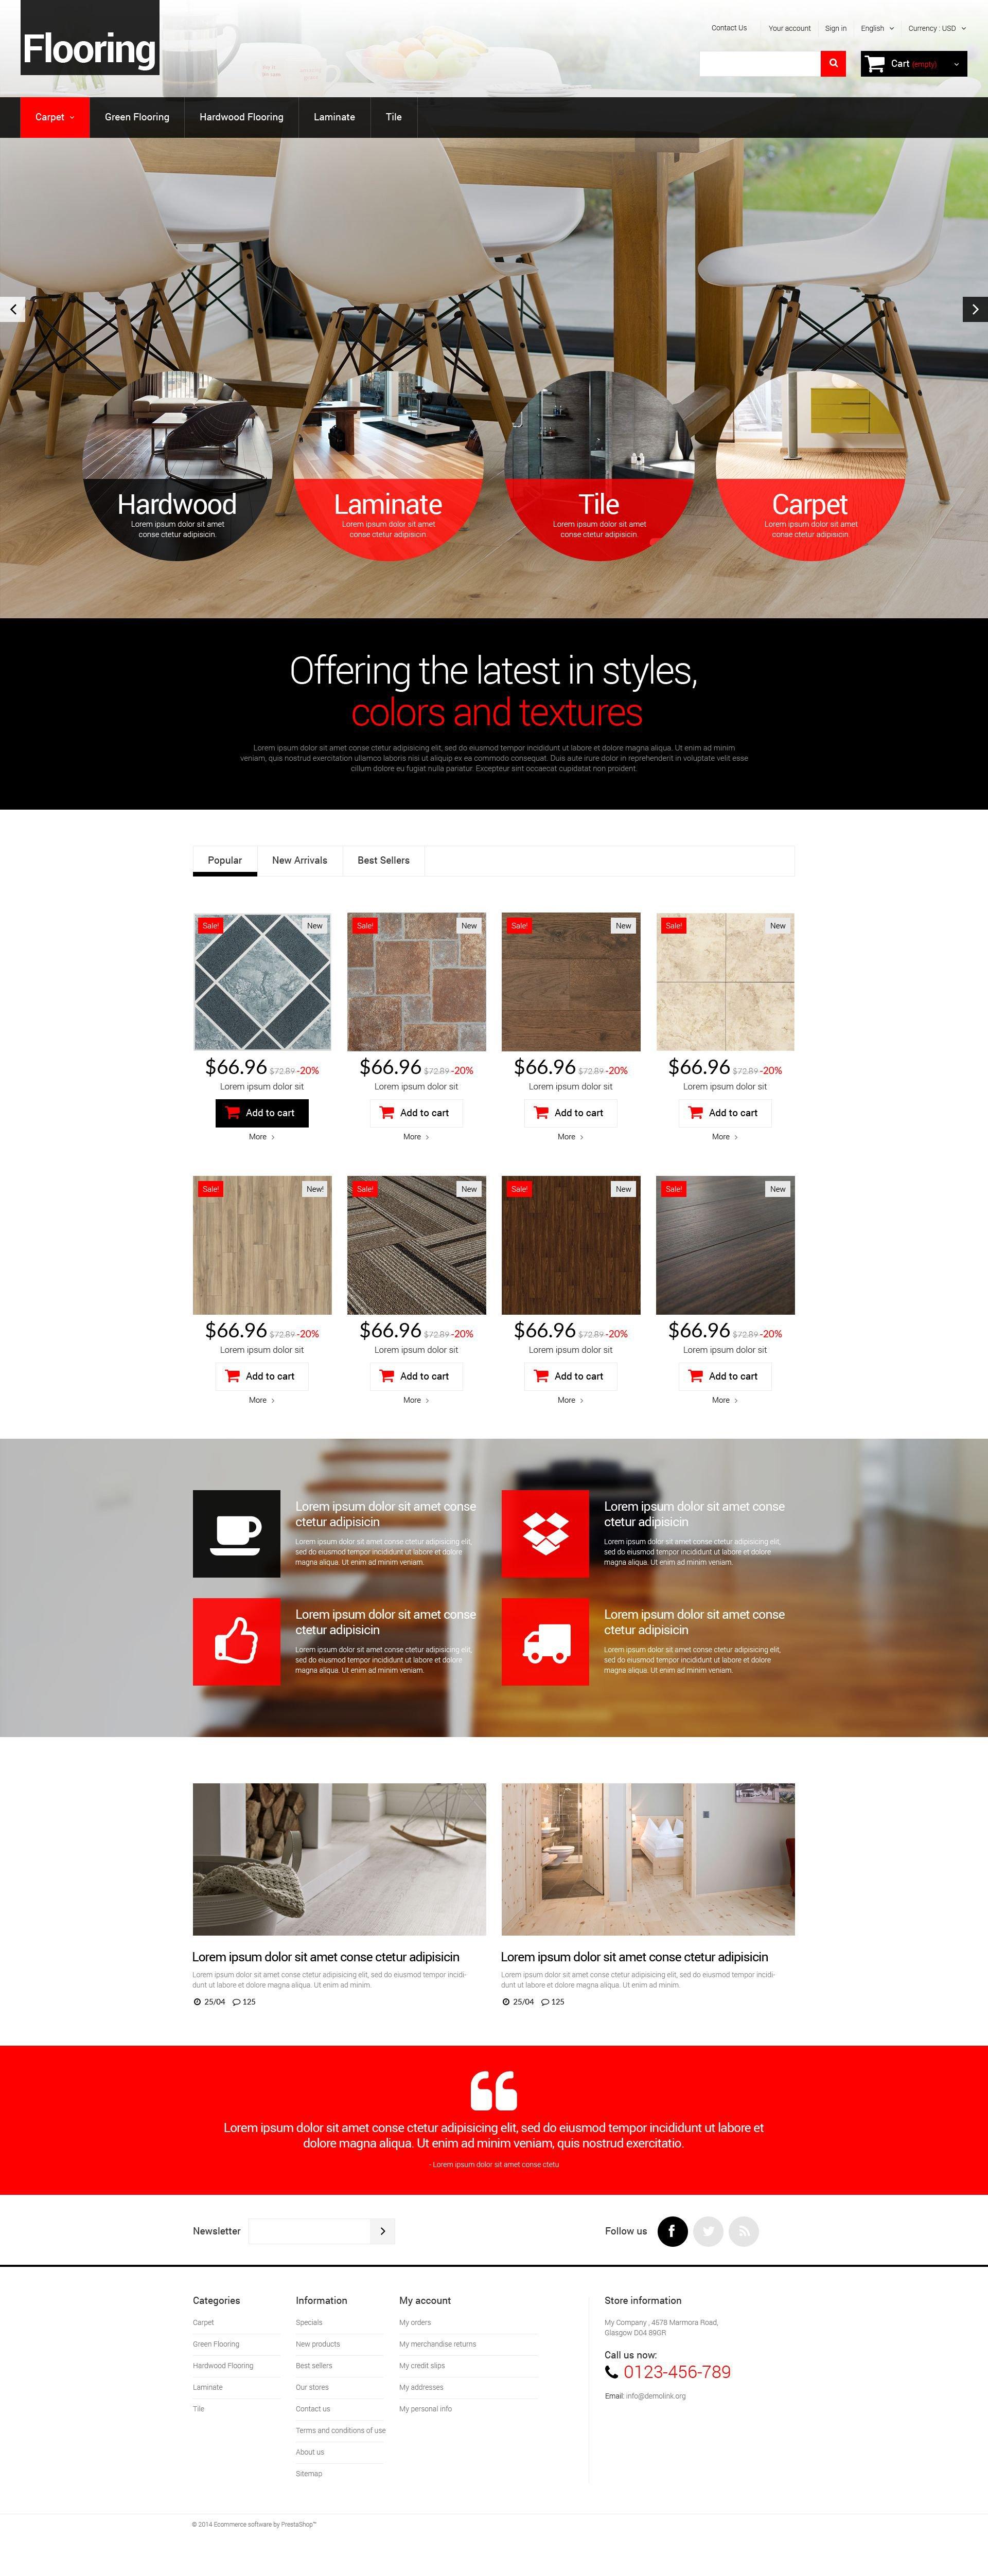 Flooring for Homes PrestaShop Theme